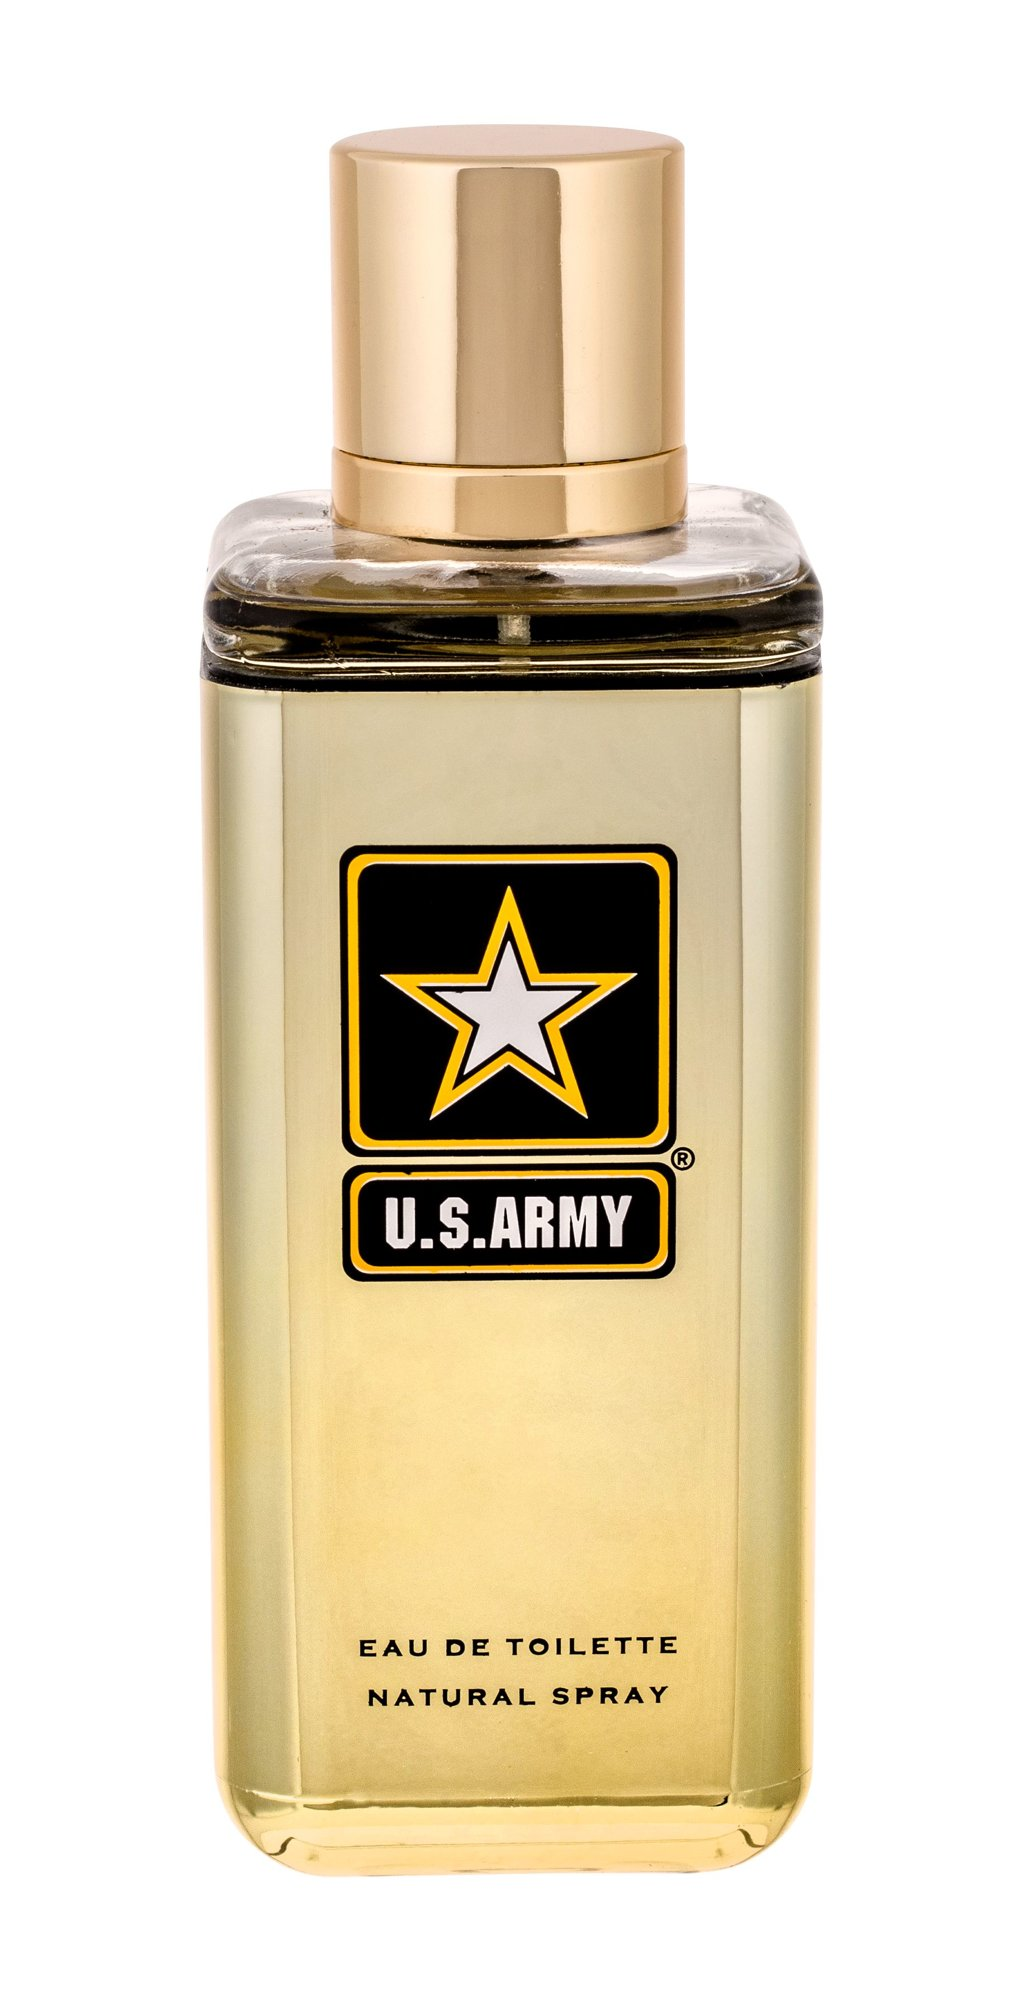 U.S.Army Gold